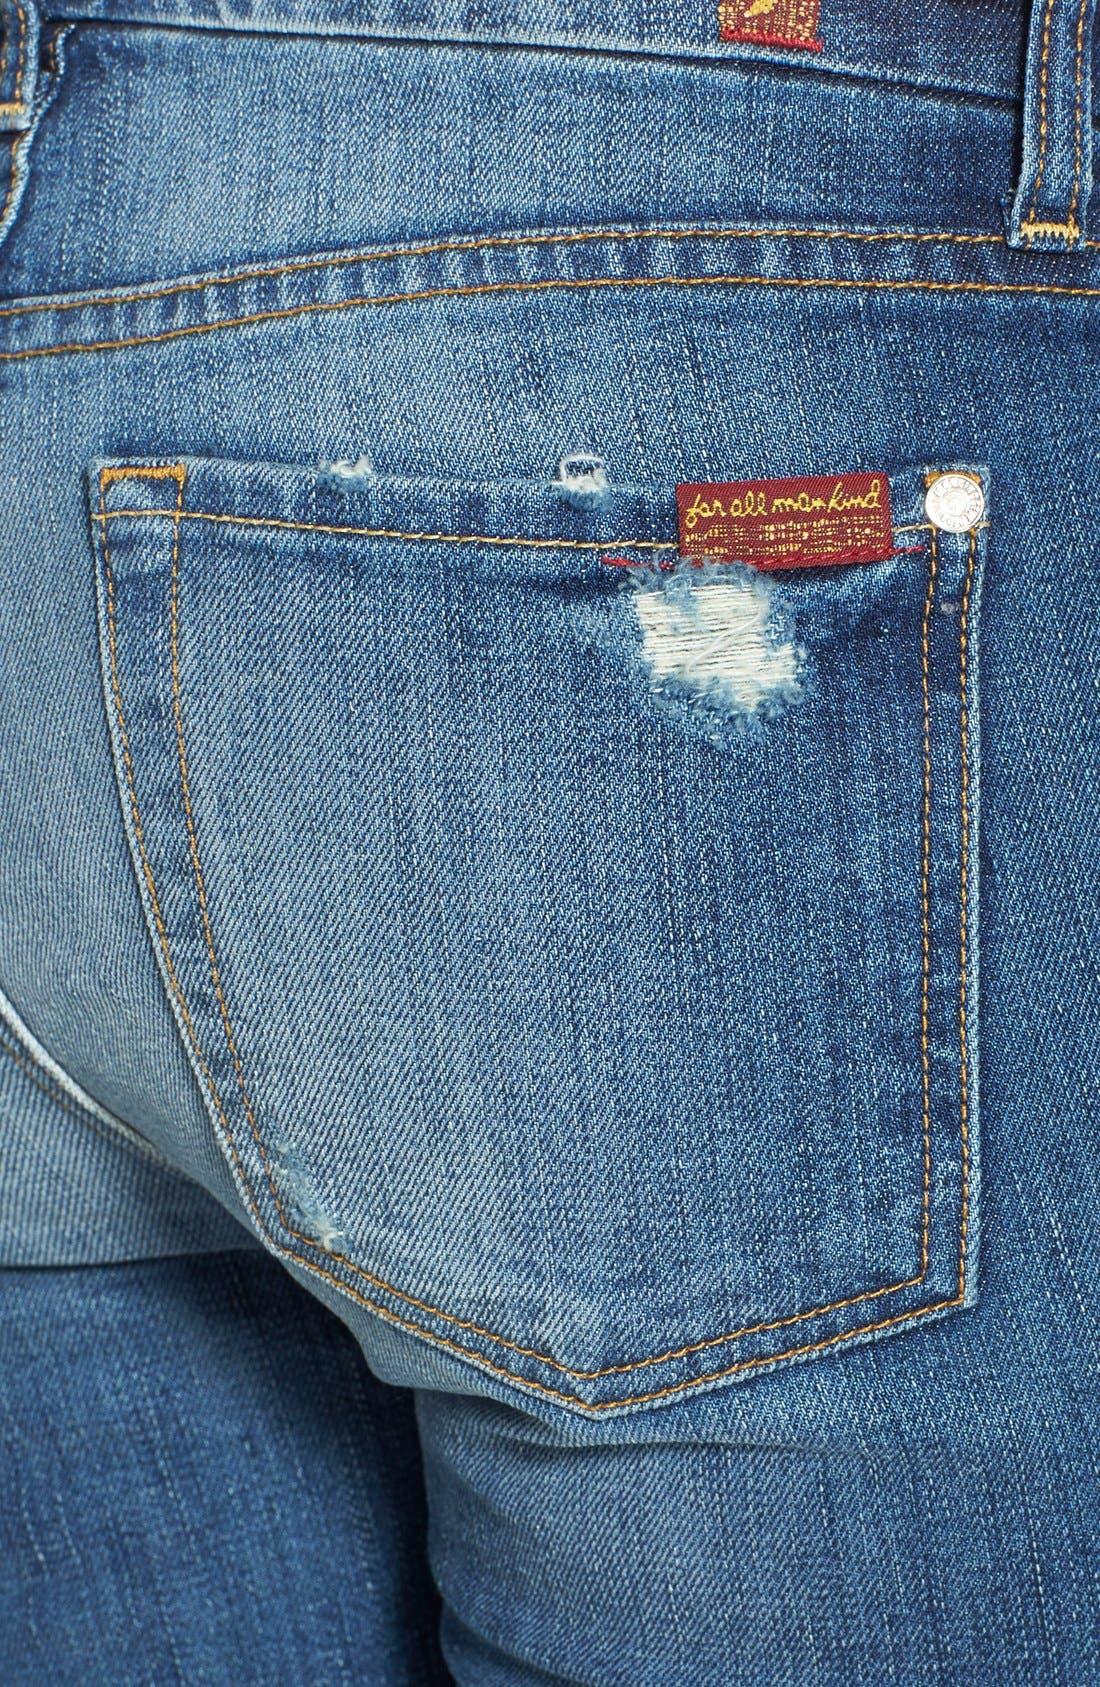 Skinny Jeans,                             Alternate thumbnail 4, color,                             400